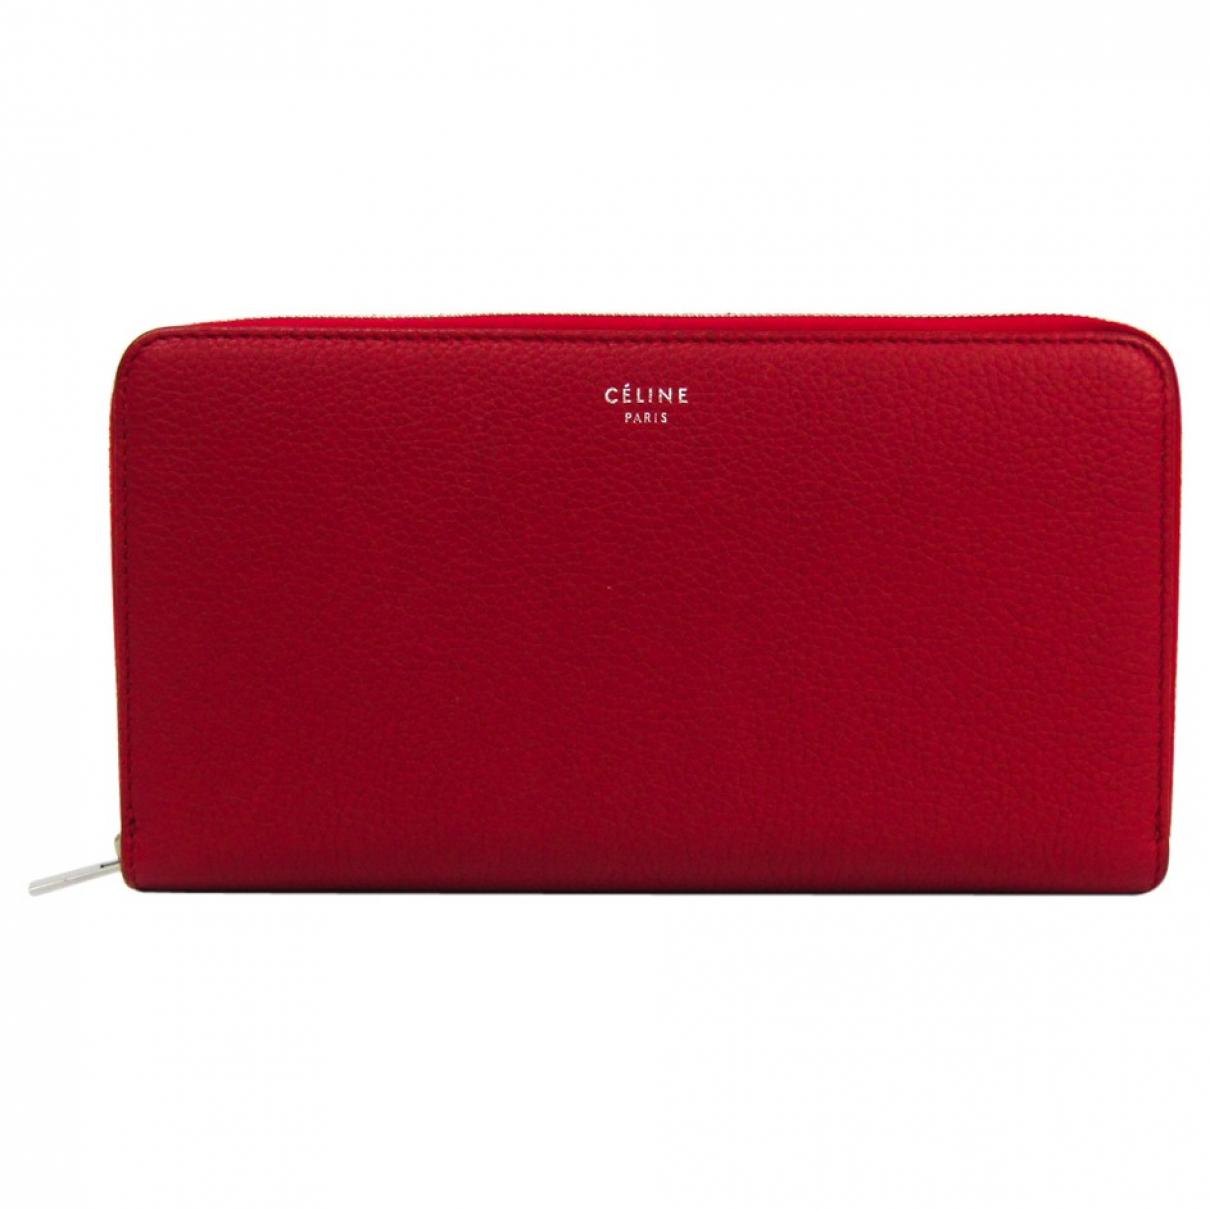 Celine N Red Leather wallet for Women N